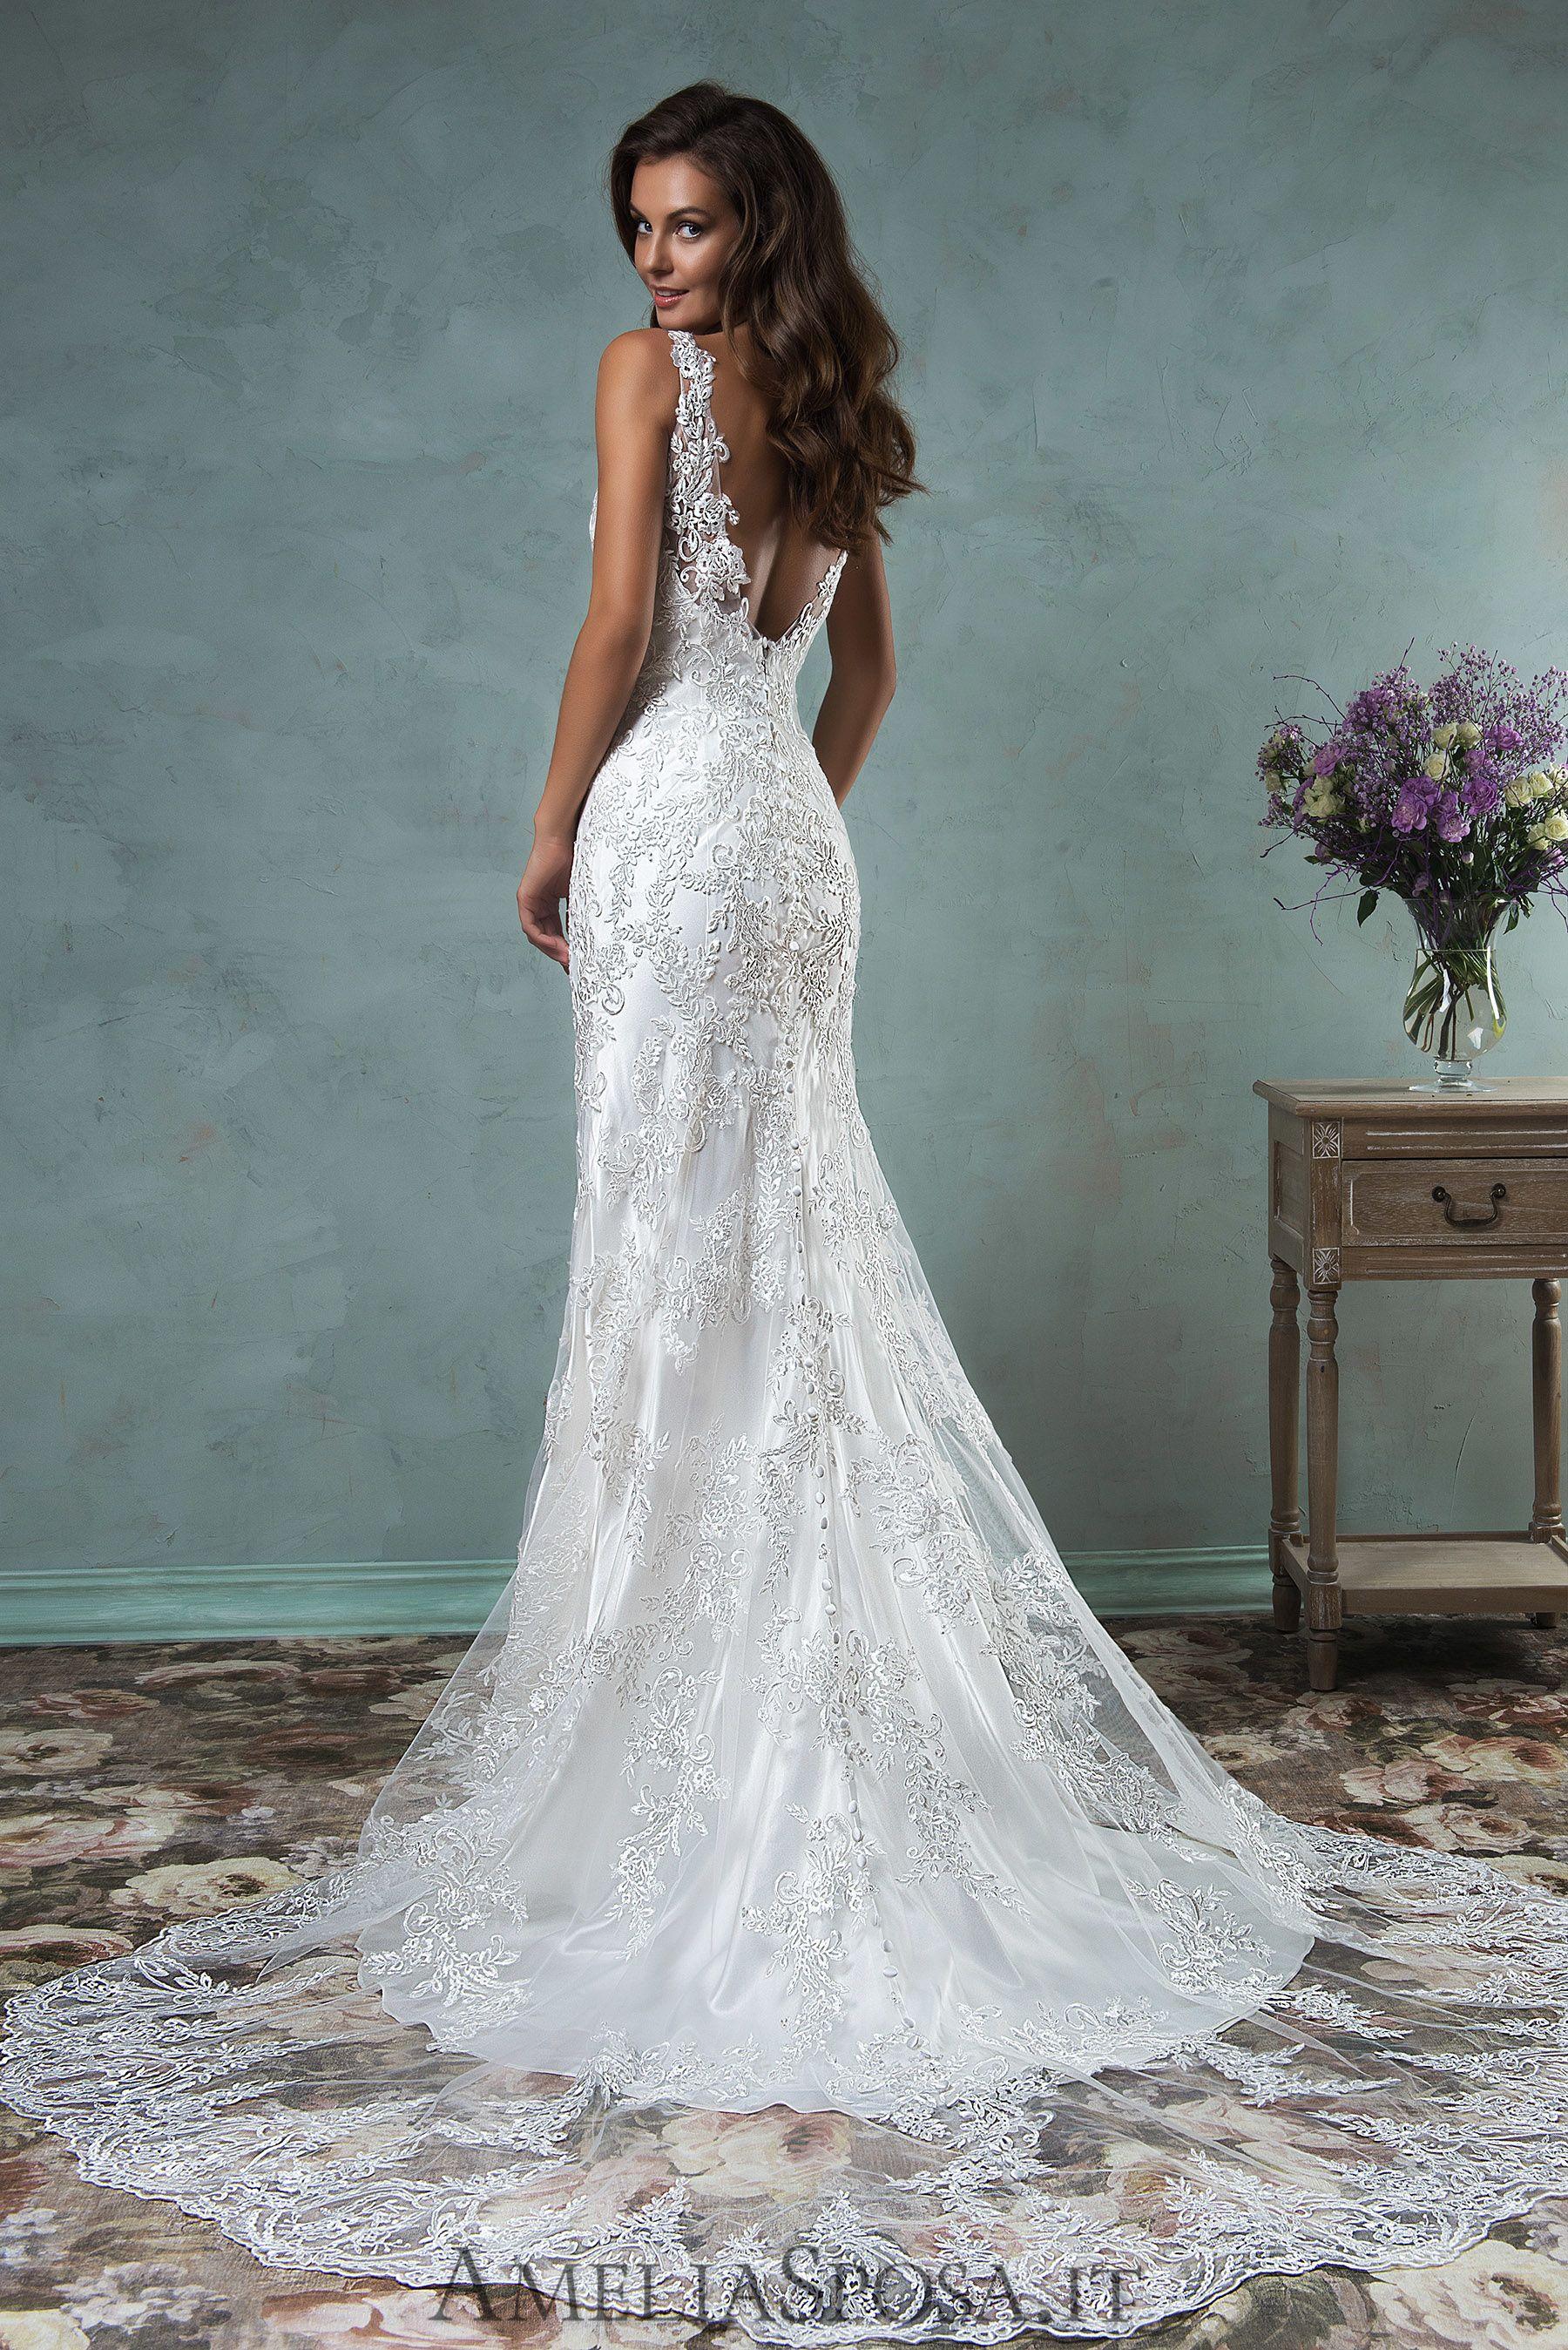 5f3b914319c6 Wedding Dress Adelina, Silhouette: Sheath / Mermaid | Wedding ...